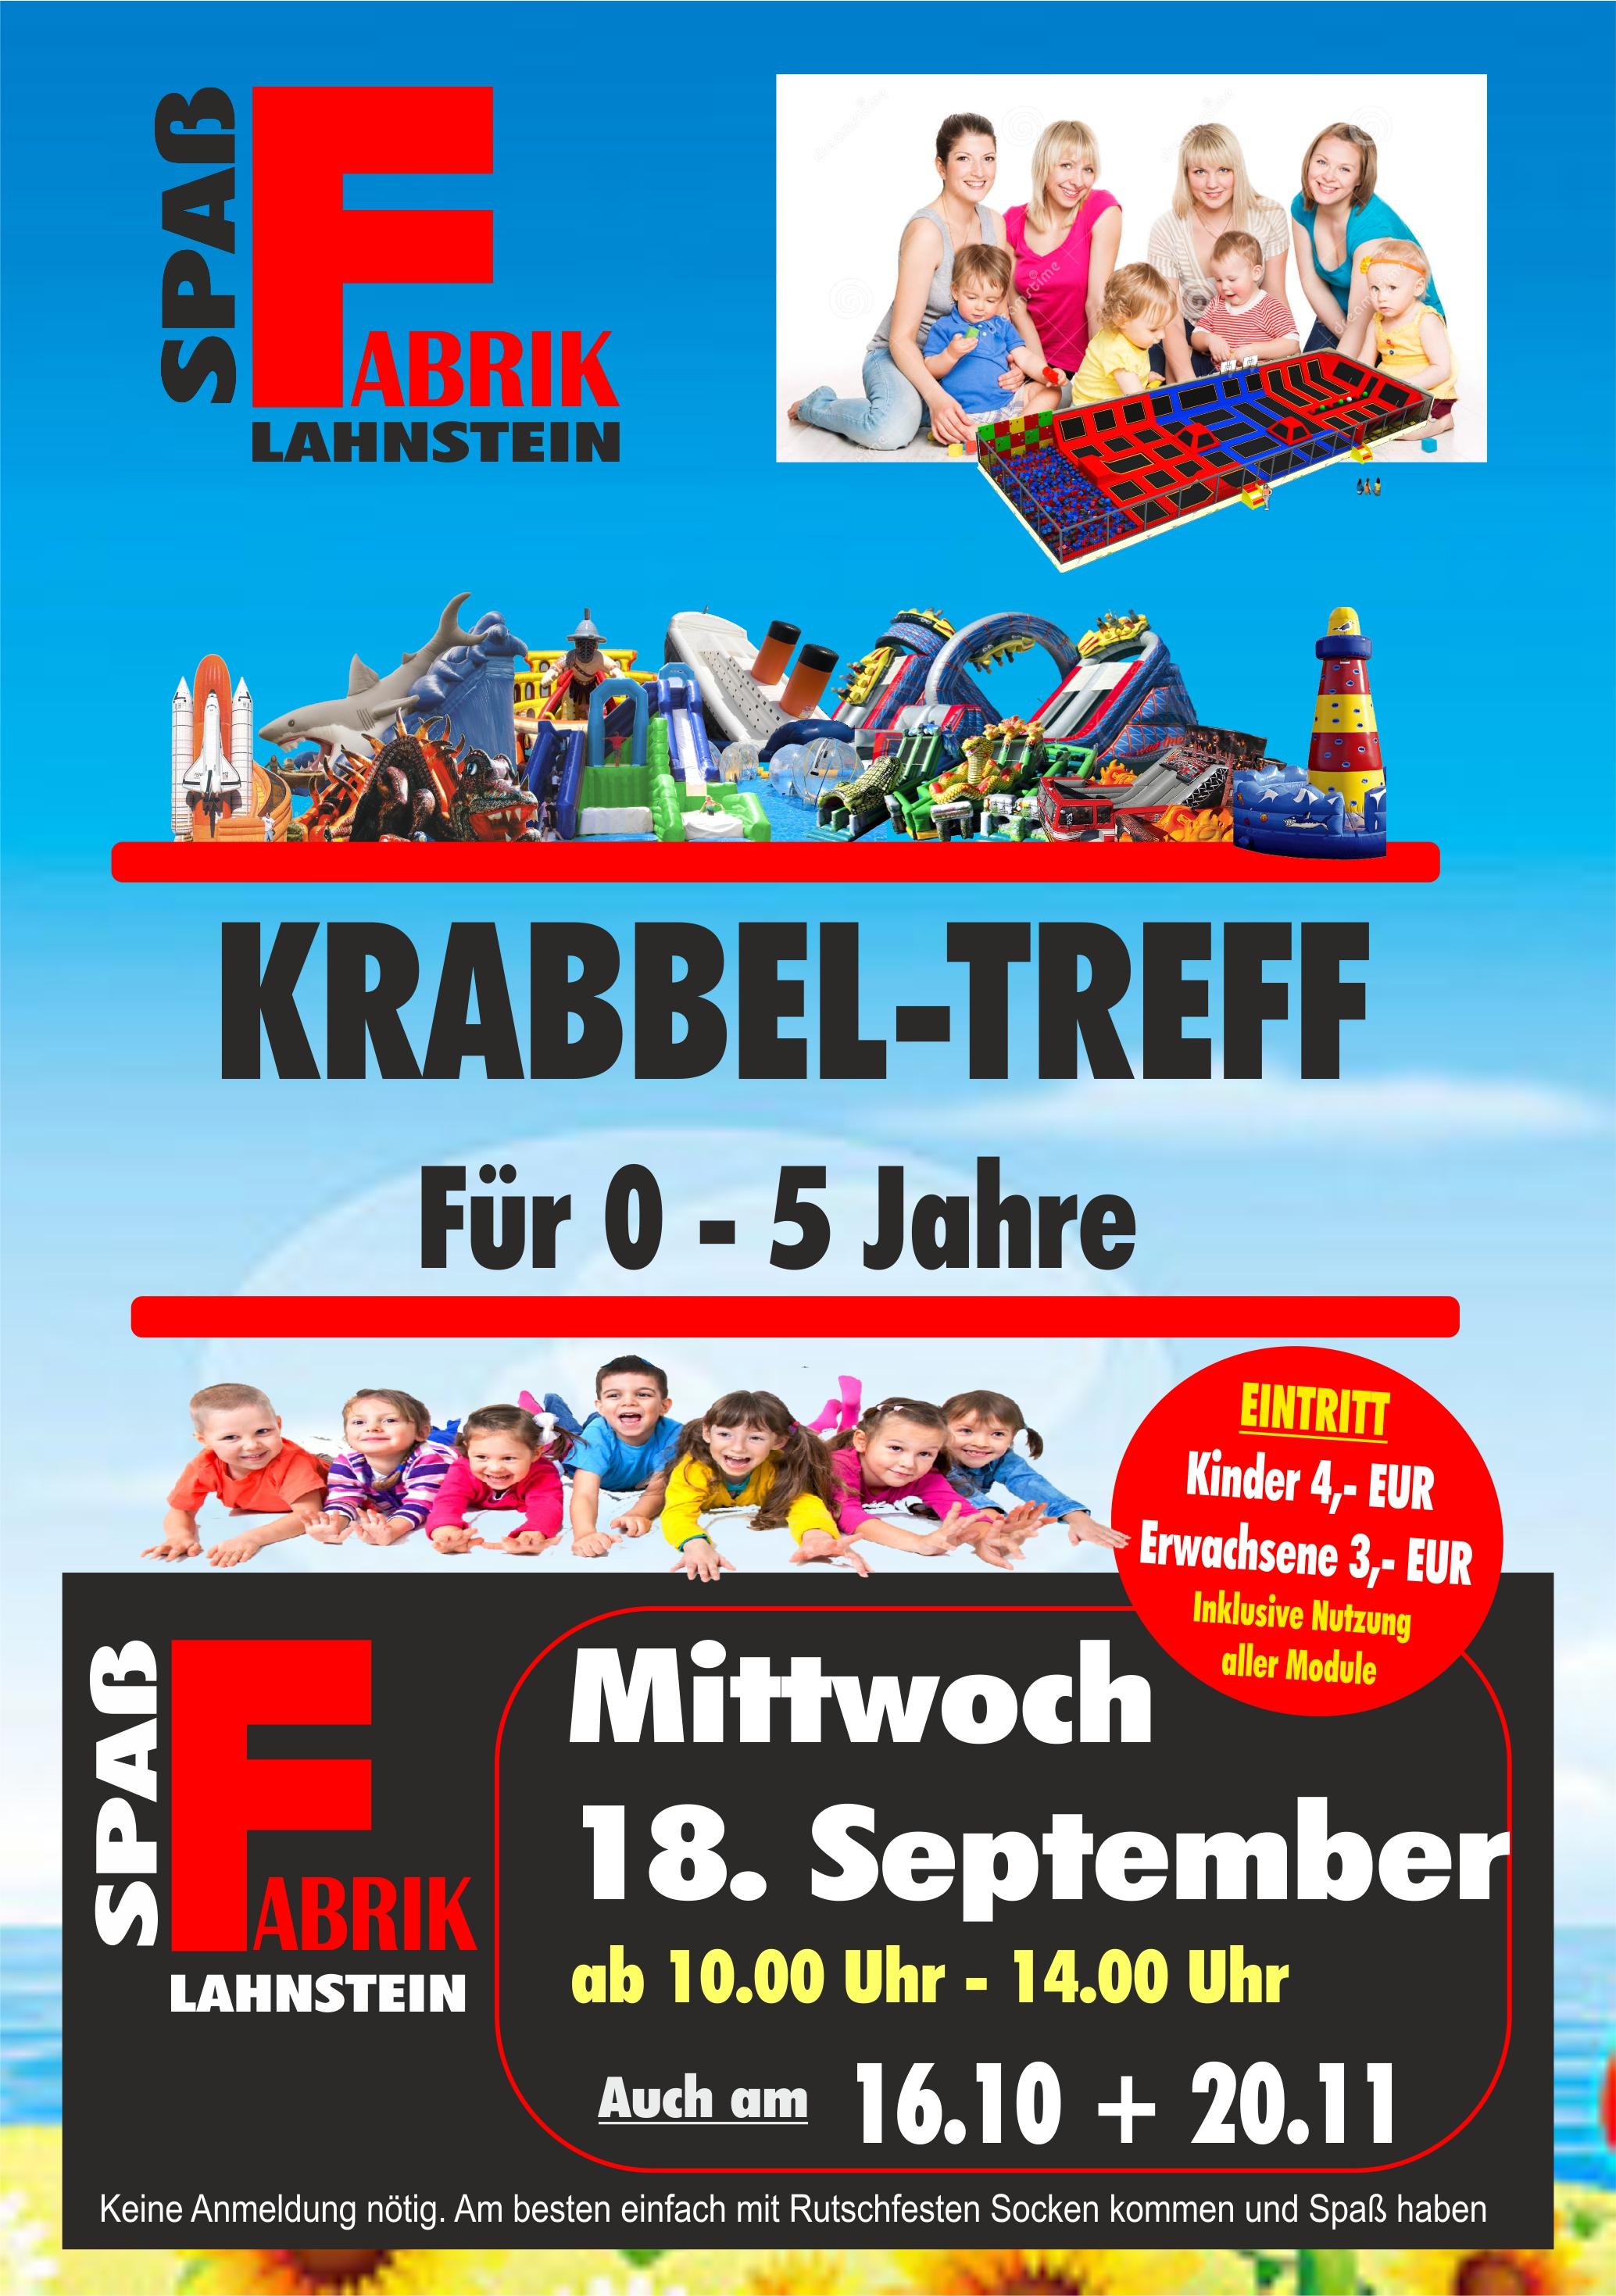 Krabbeltreff Spaßfabrik Lahnstein